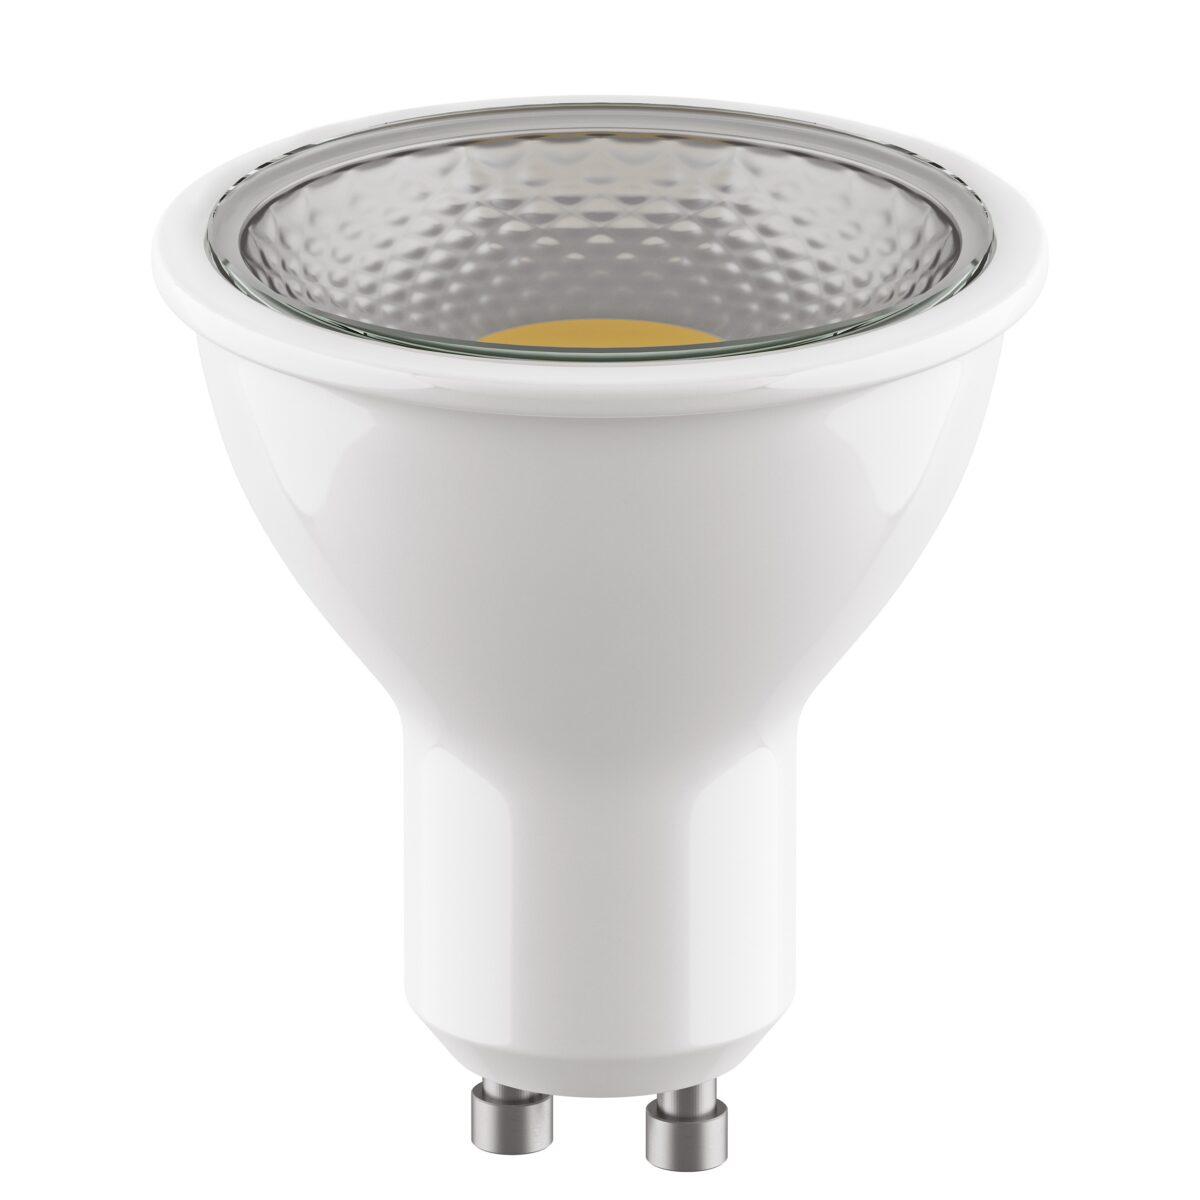 940282 Лампа LED 220V HP16 GU10 7W=60W 350LM 55G CL 3000K 20000H (в комплекте)